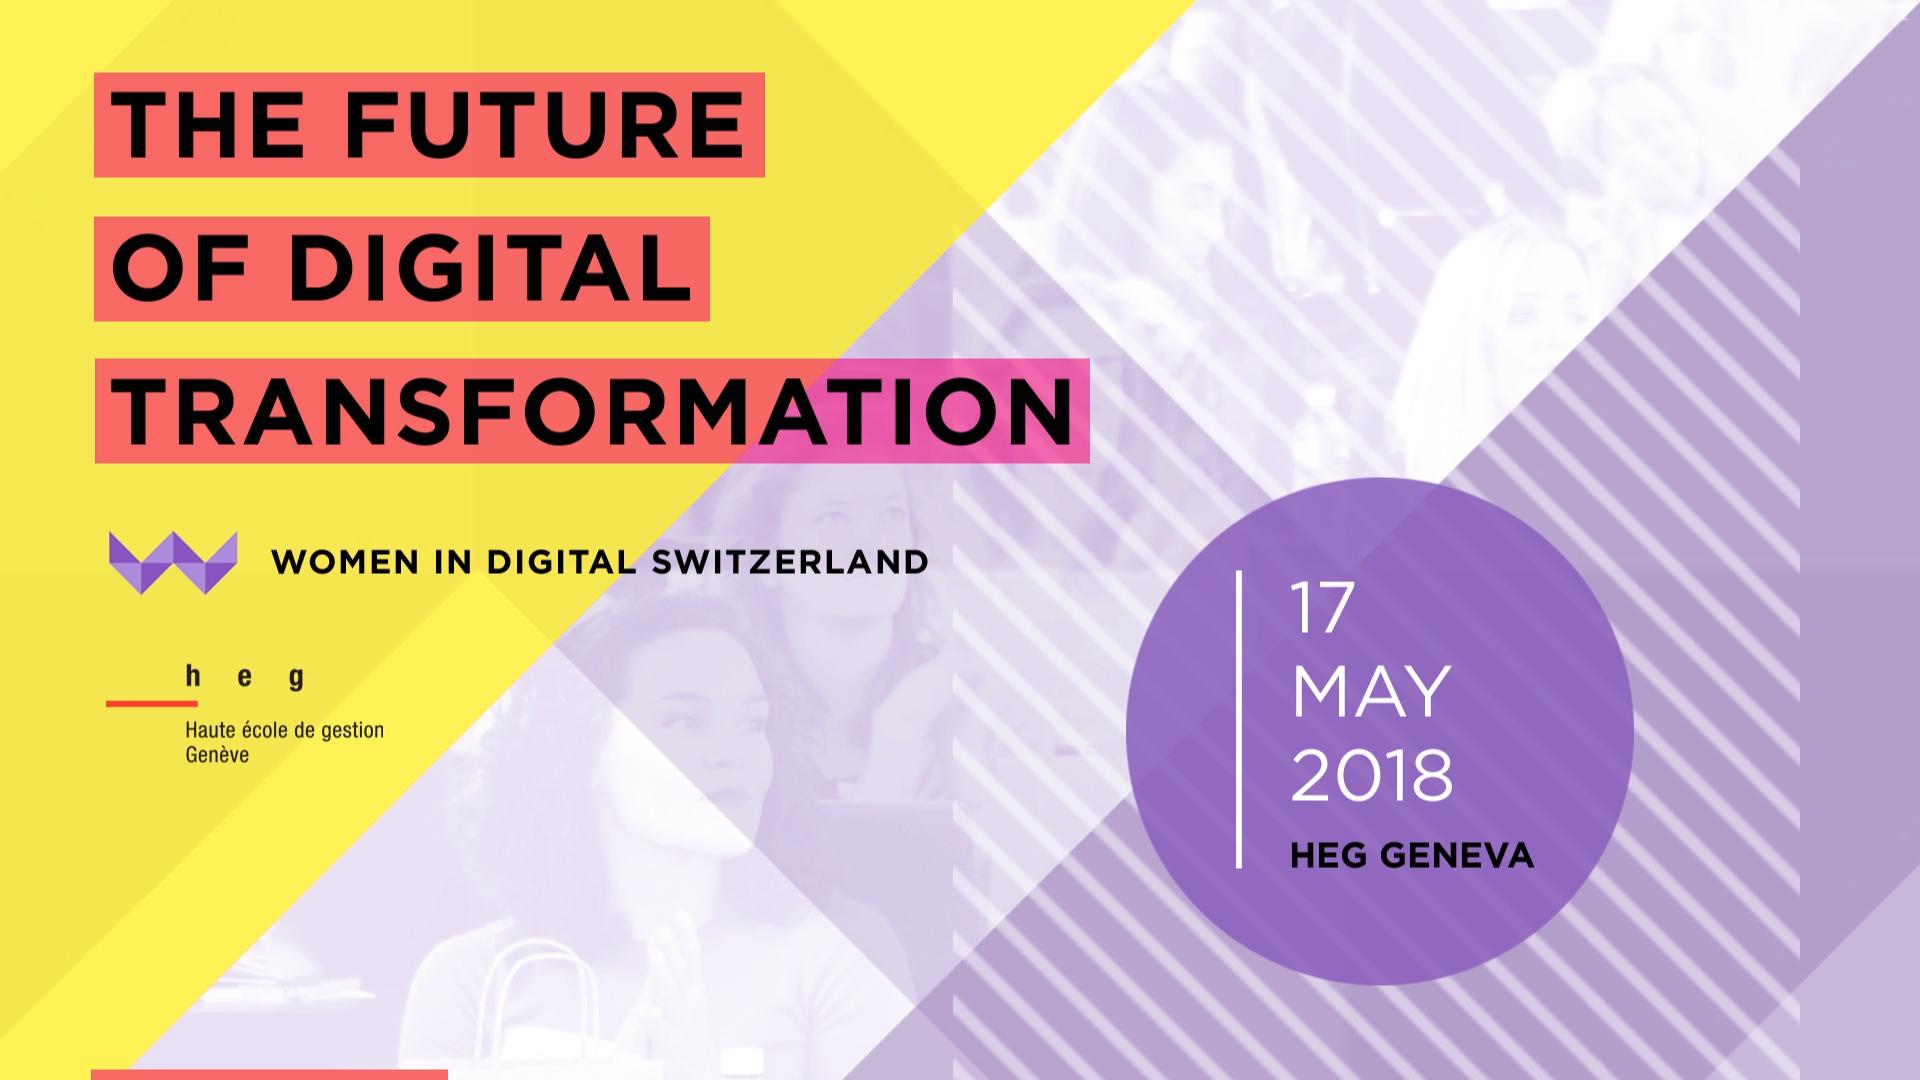 The Future of Digital Transformation